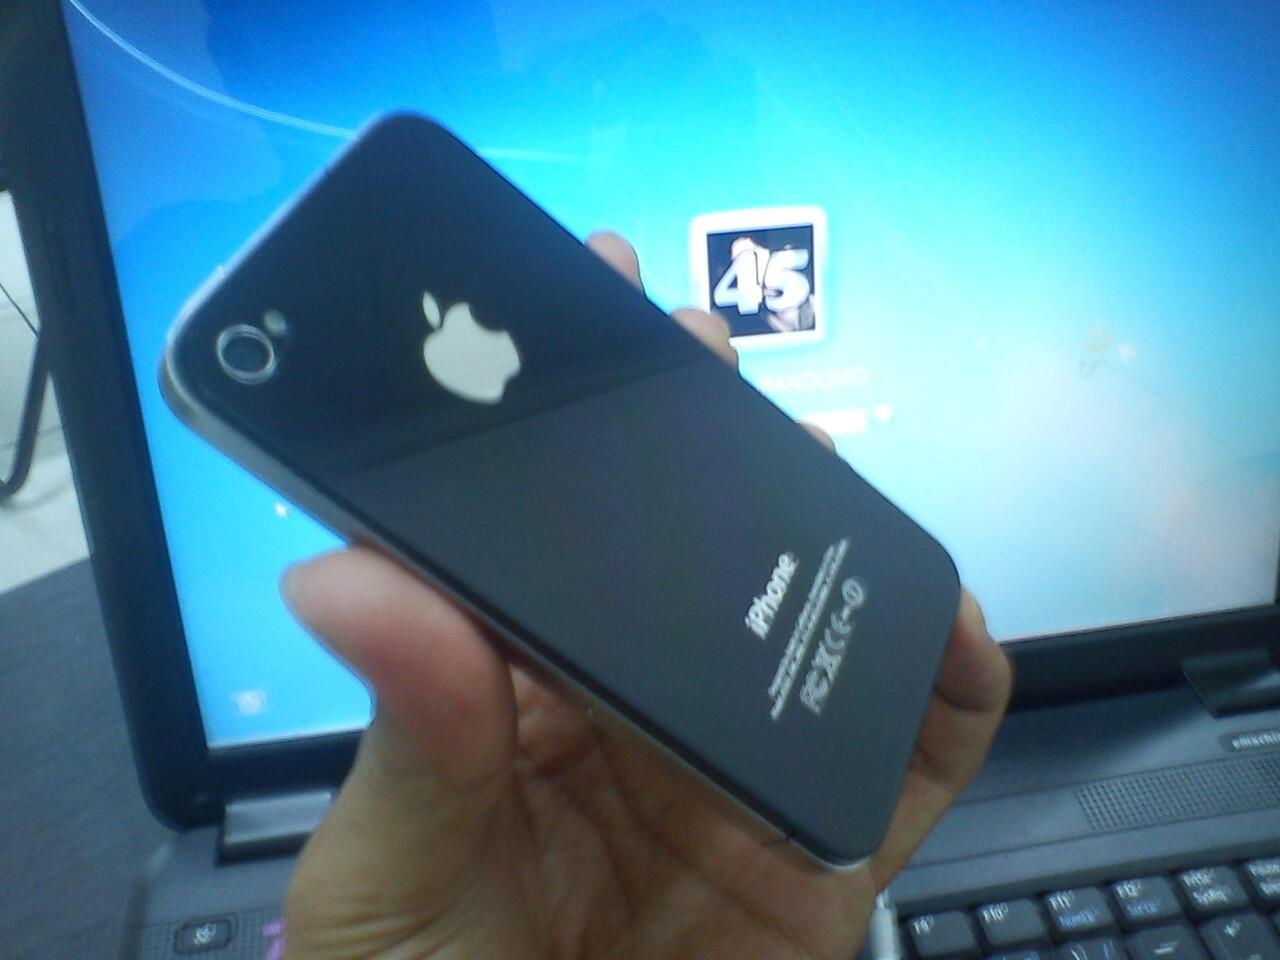 iPhone 4 32GB Black FU 3 jutaan WOW